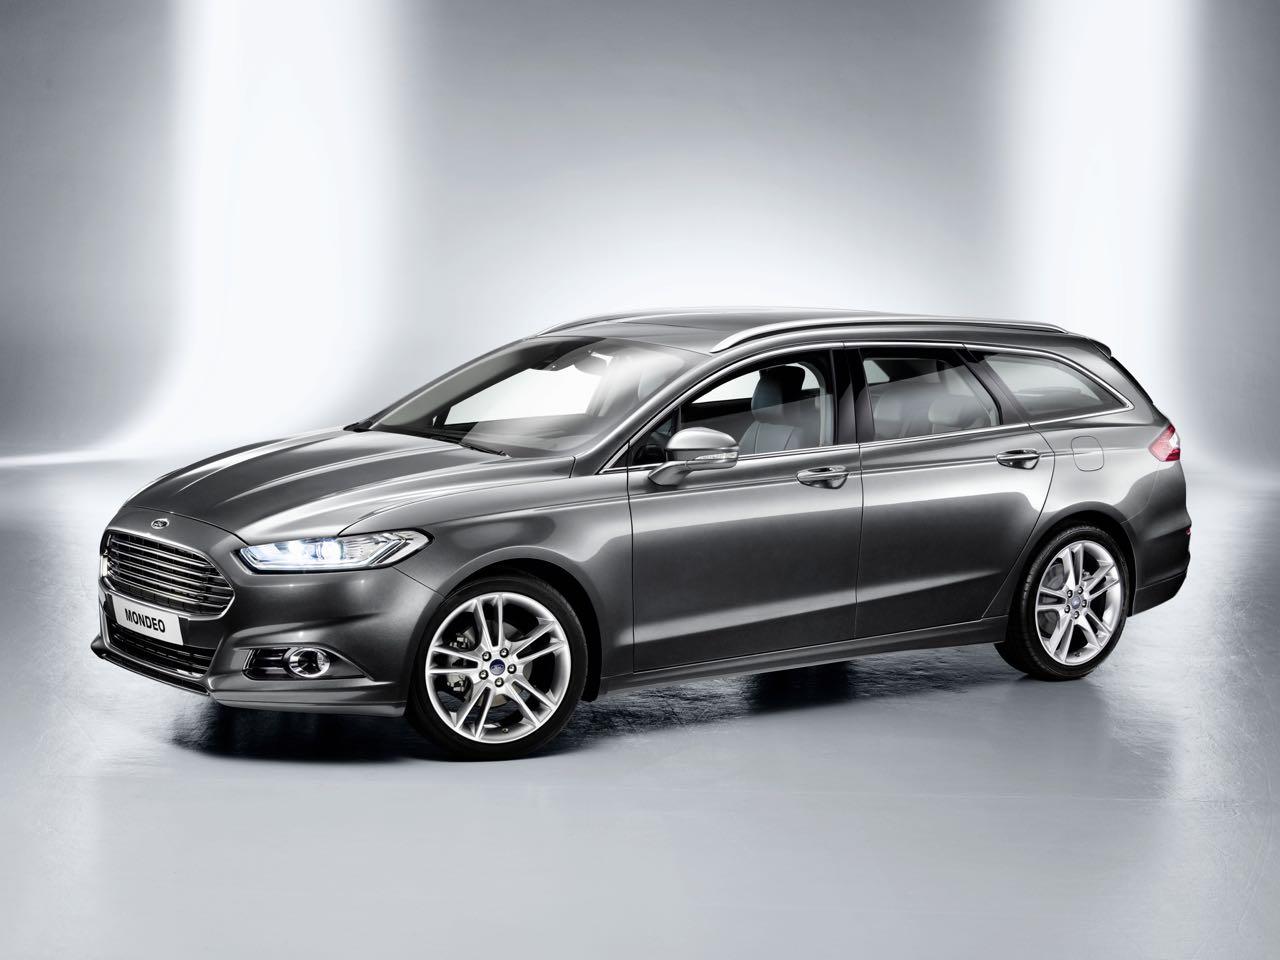 Ford Mondeo Sportbreak 2015 – 1